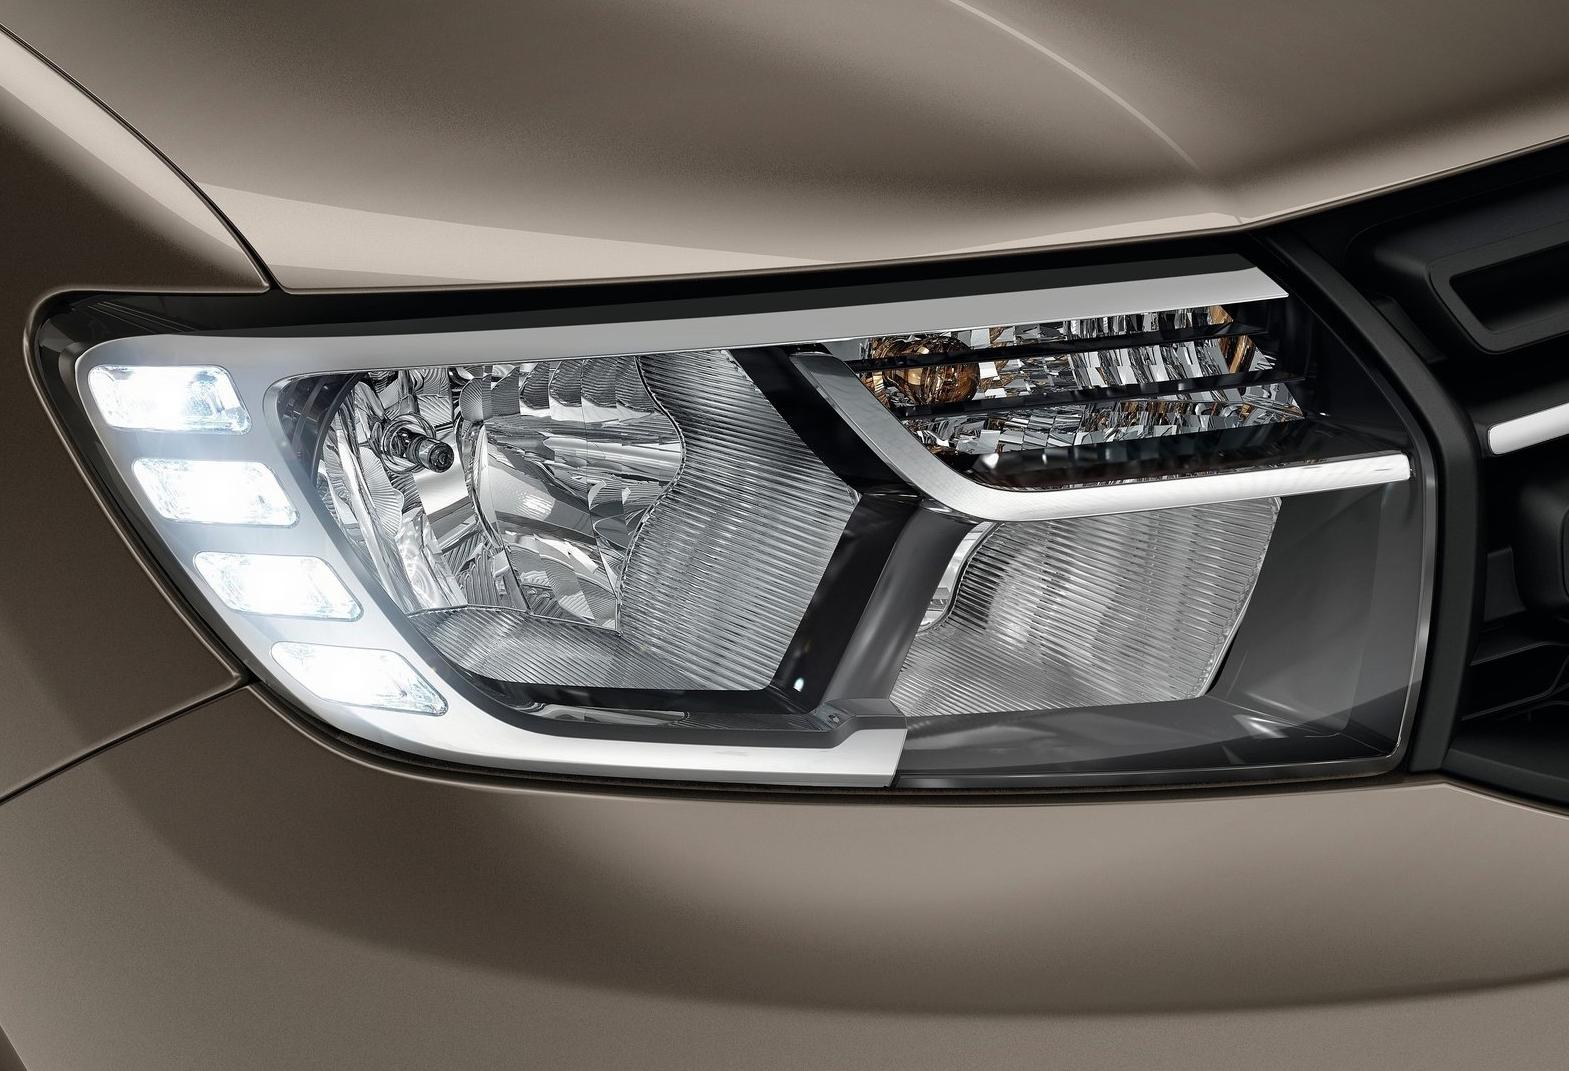 Inchiriere Dacia Logan. Detaliu far